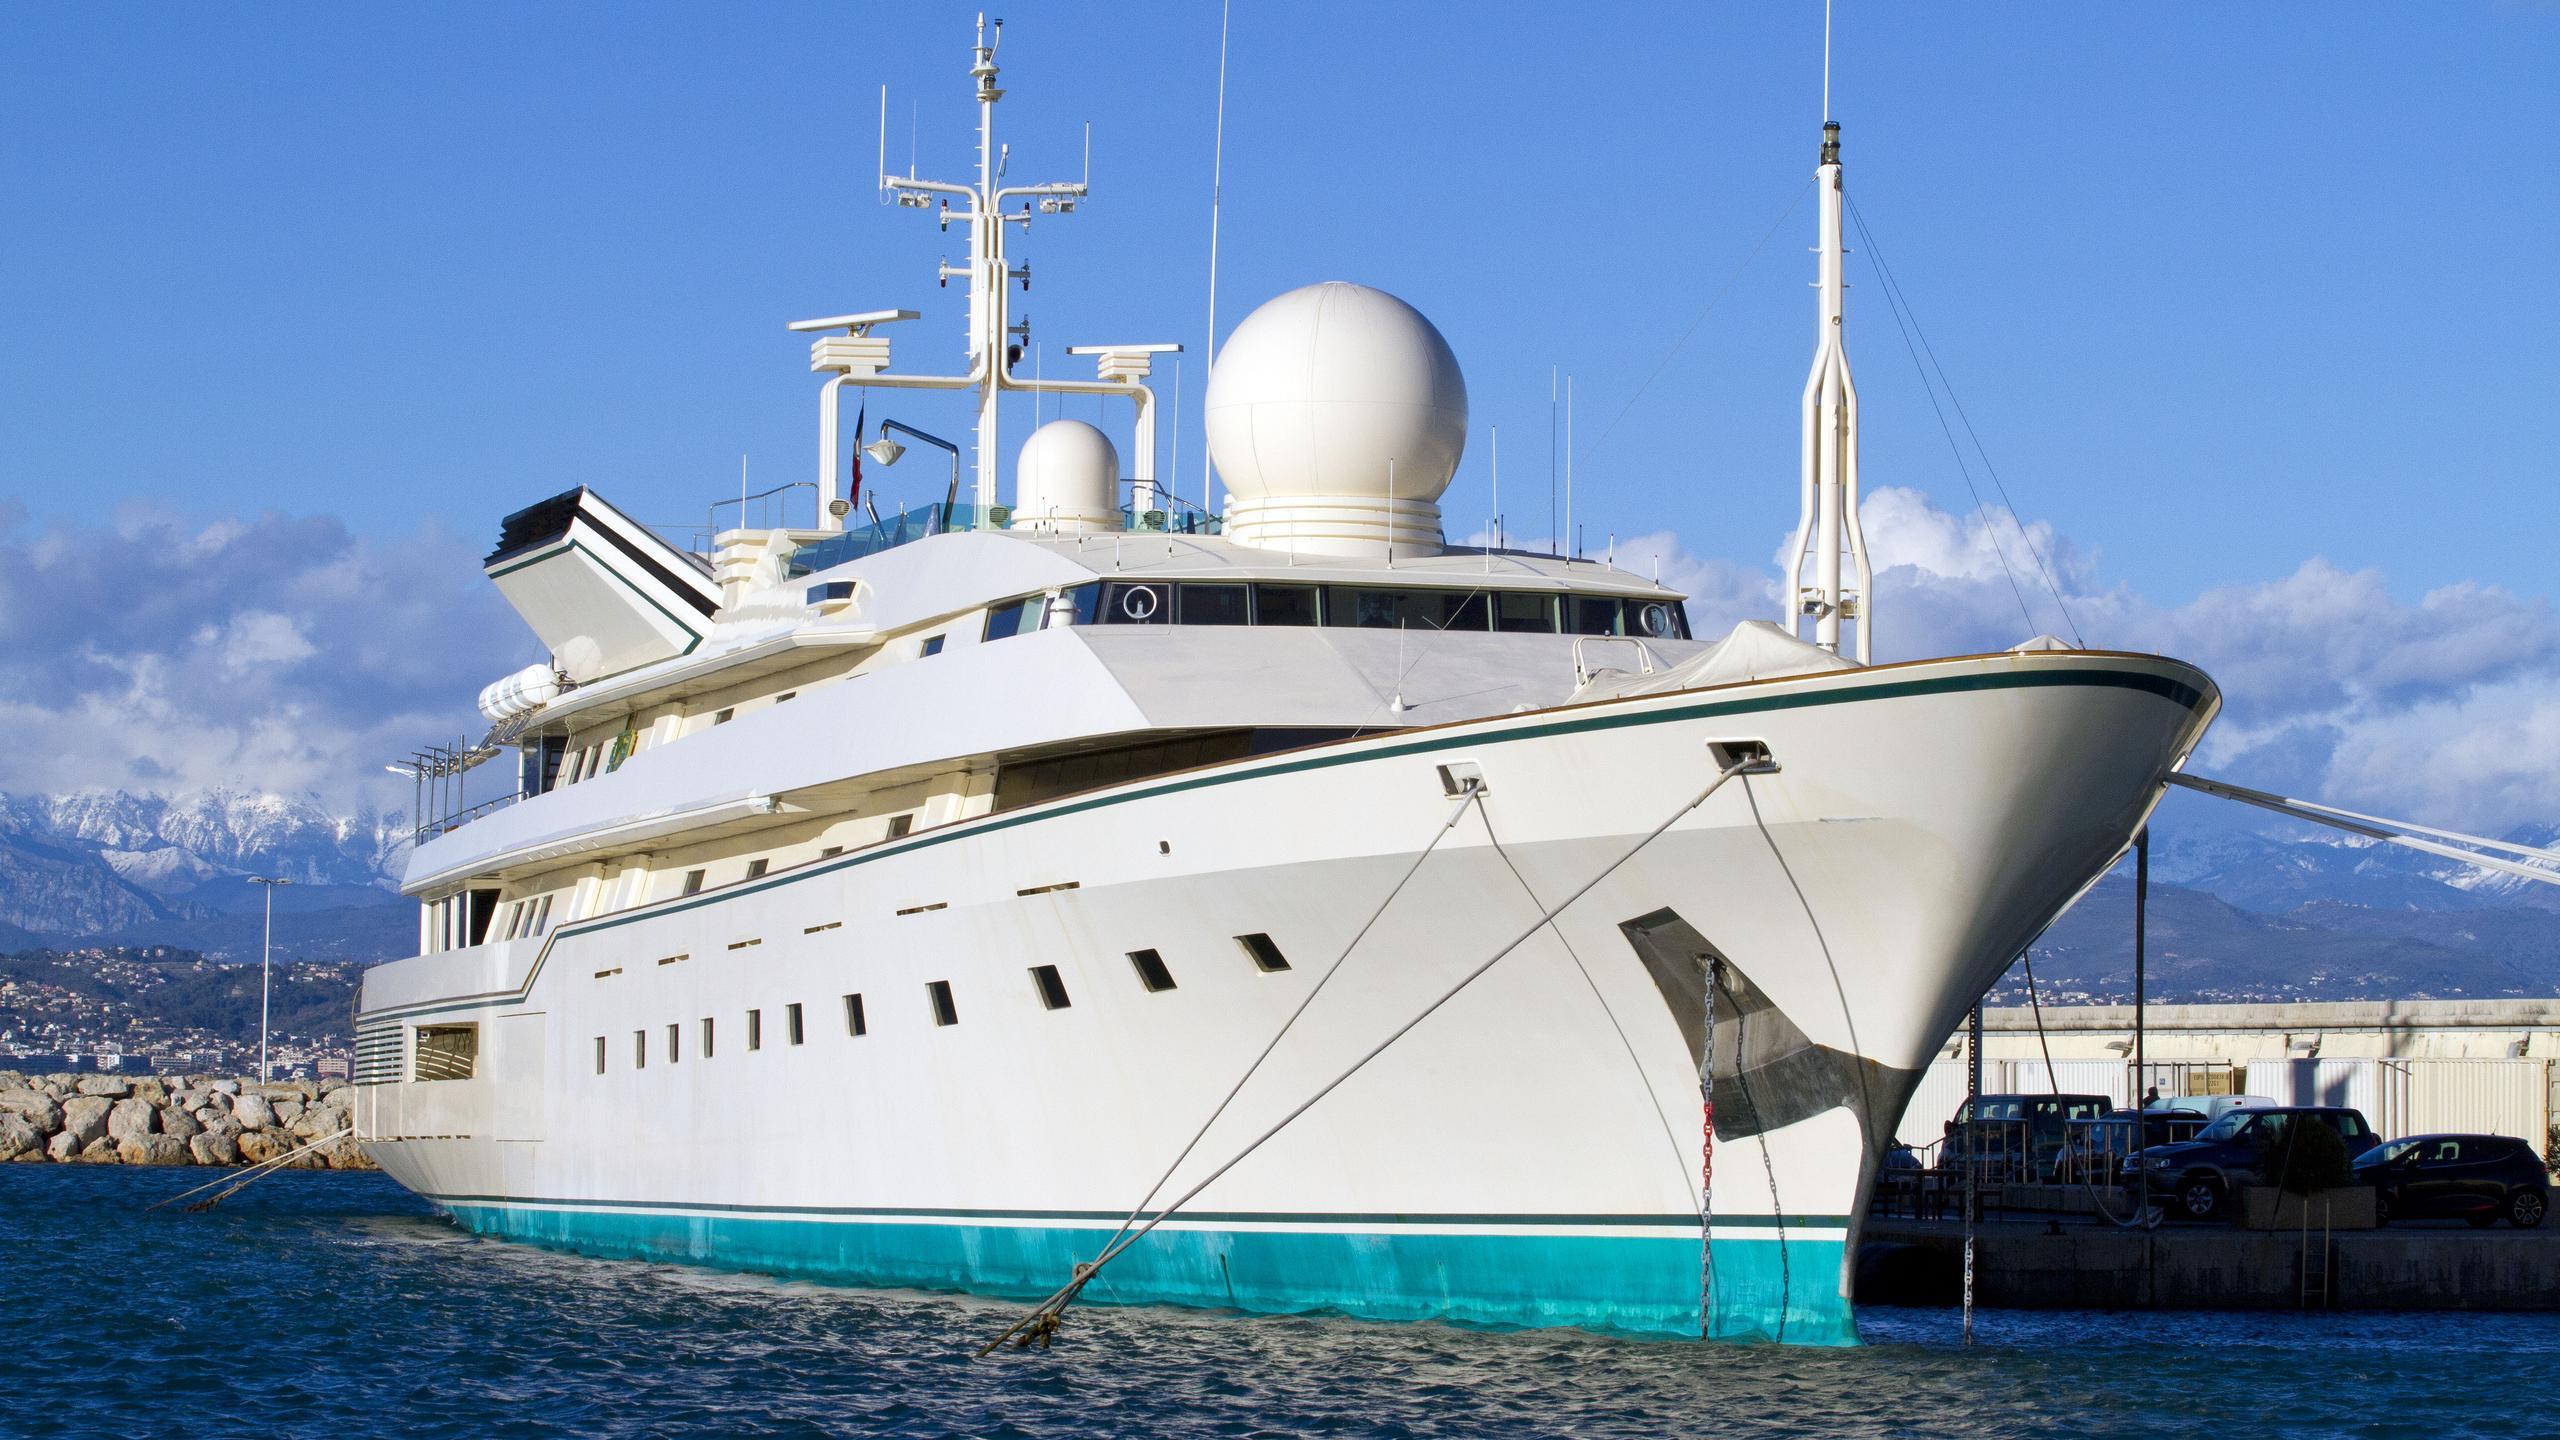 kingdom-5kr-motor-yacht-benetti-1980-86m-half-profile